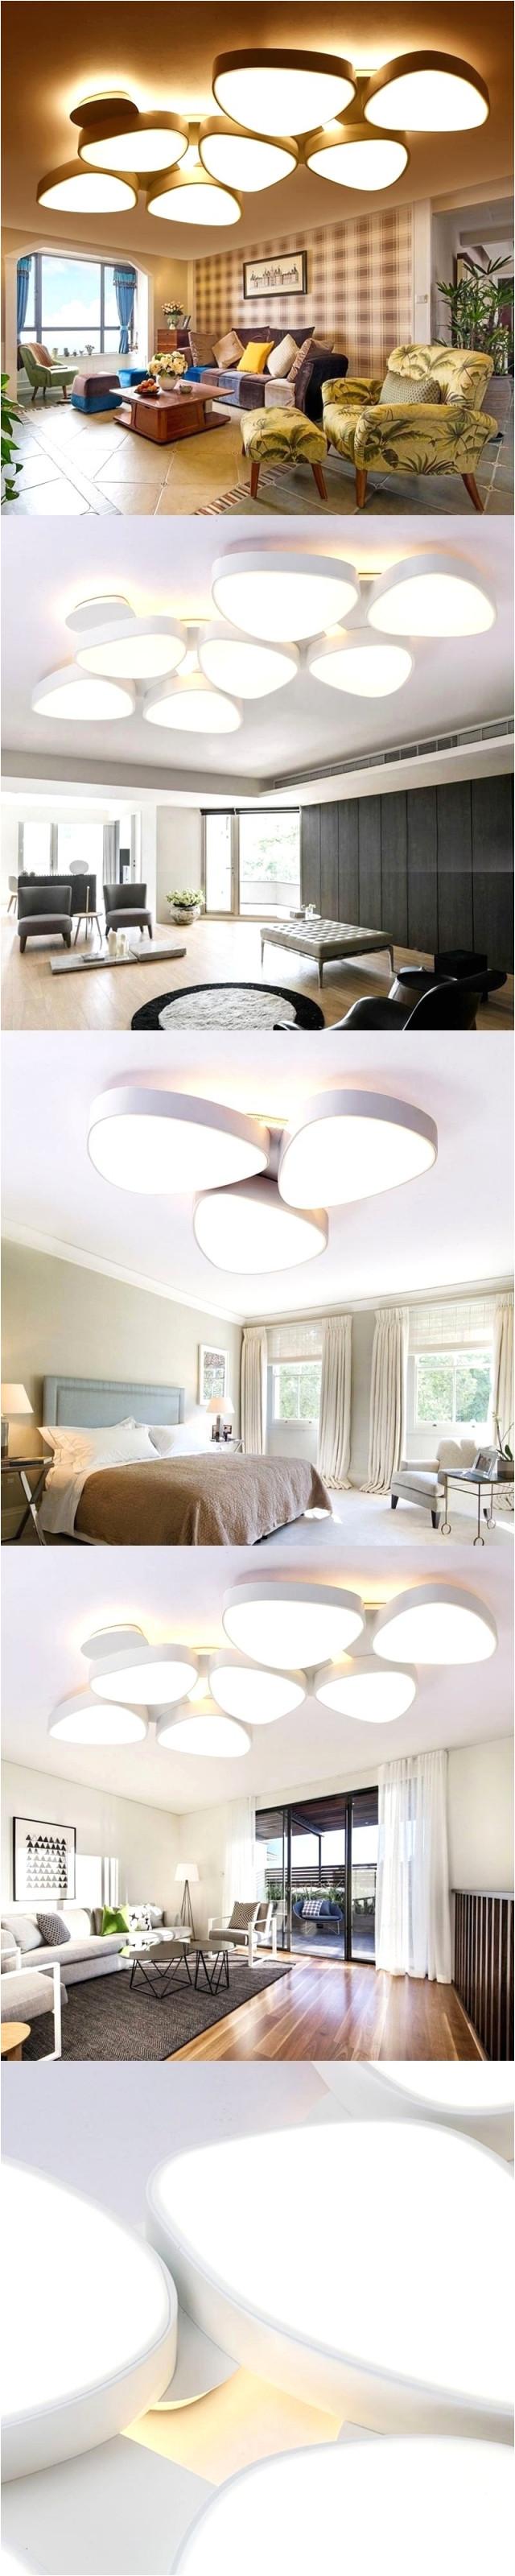 image of 32 elegant bedroom sconces lighting douglaschannelenergy